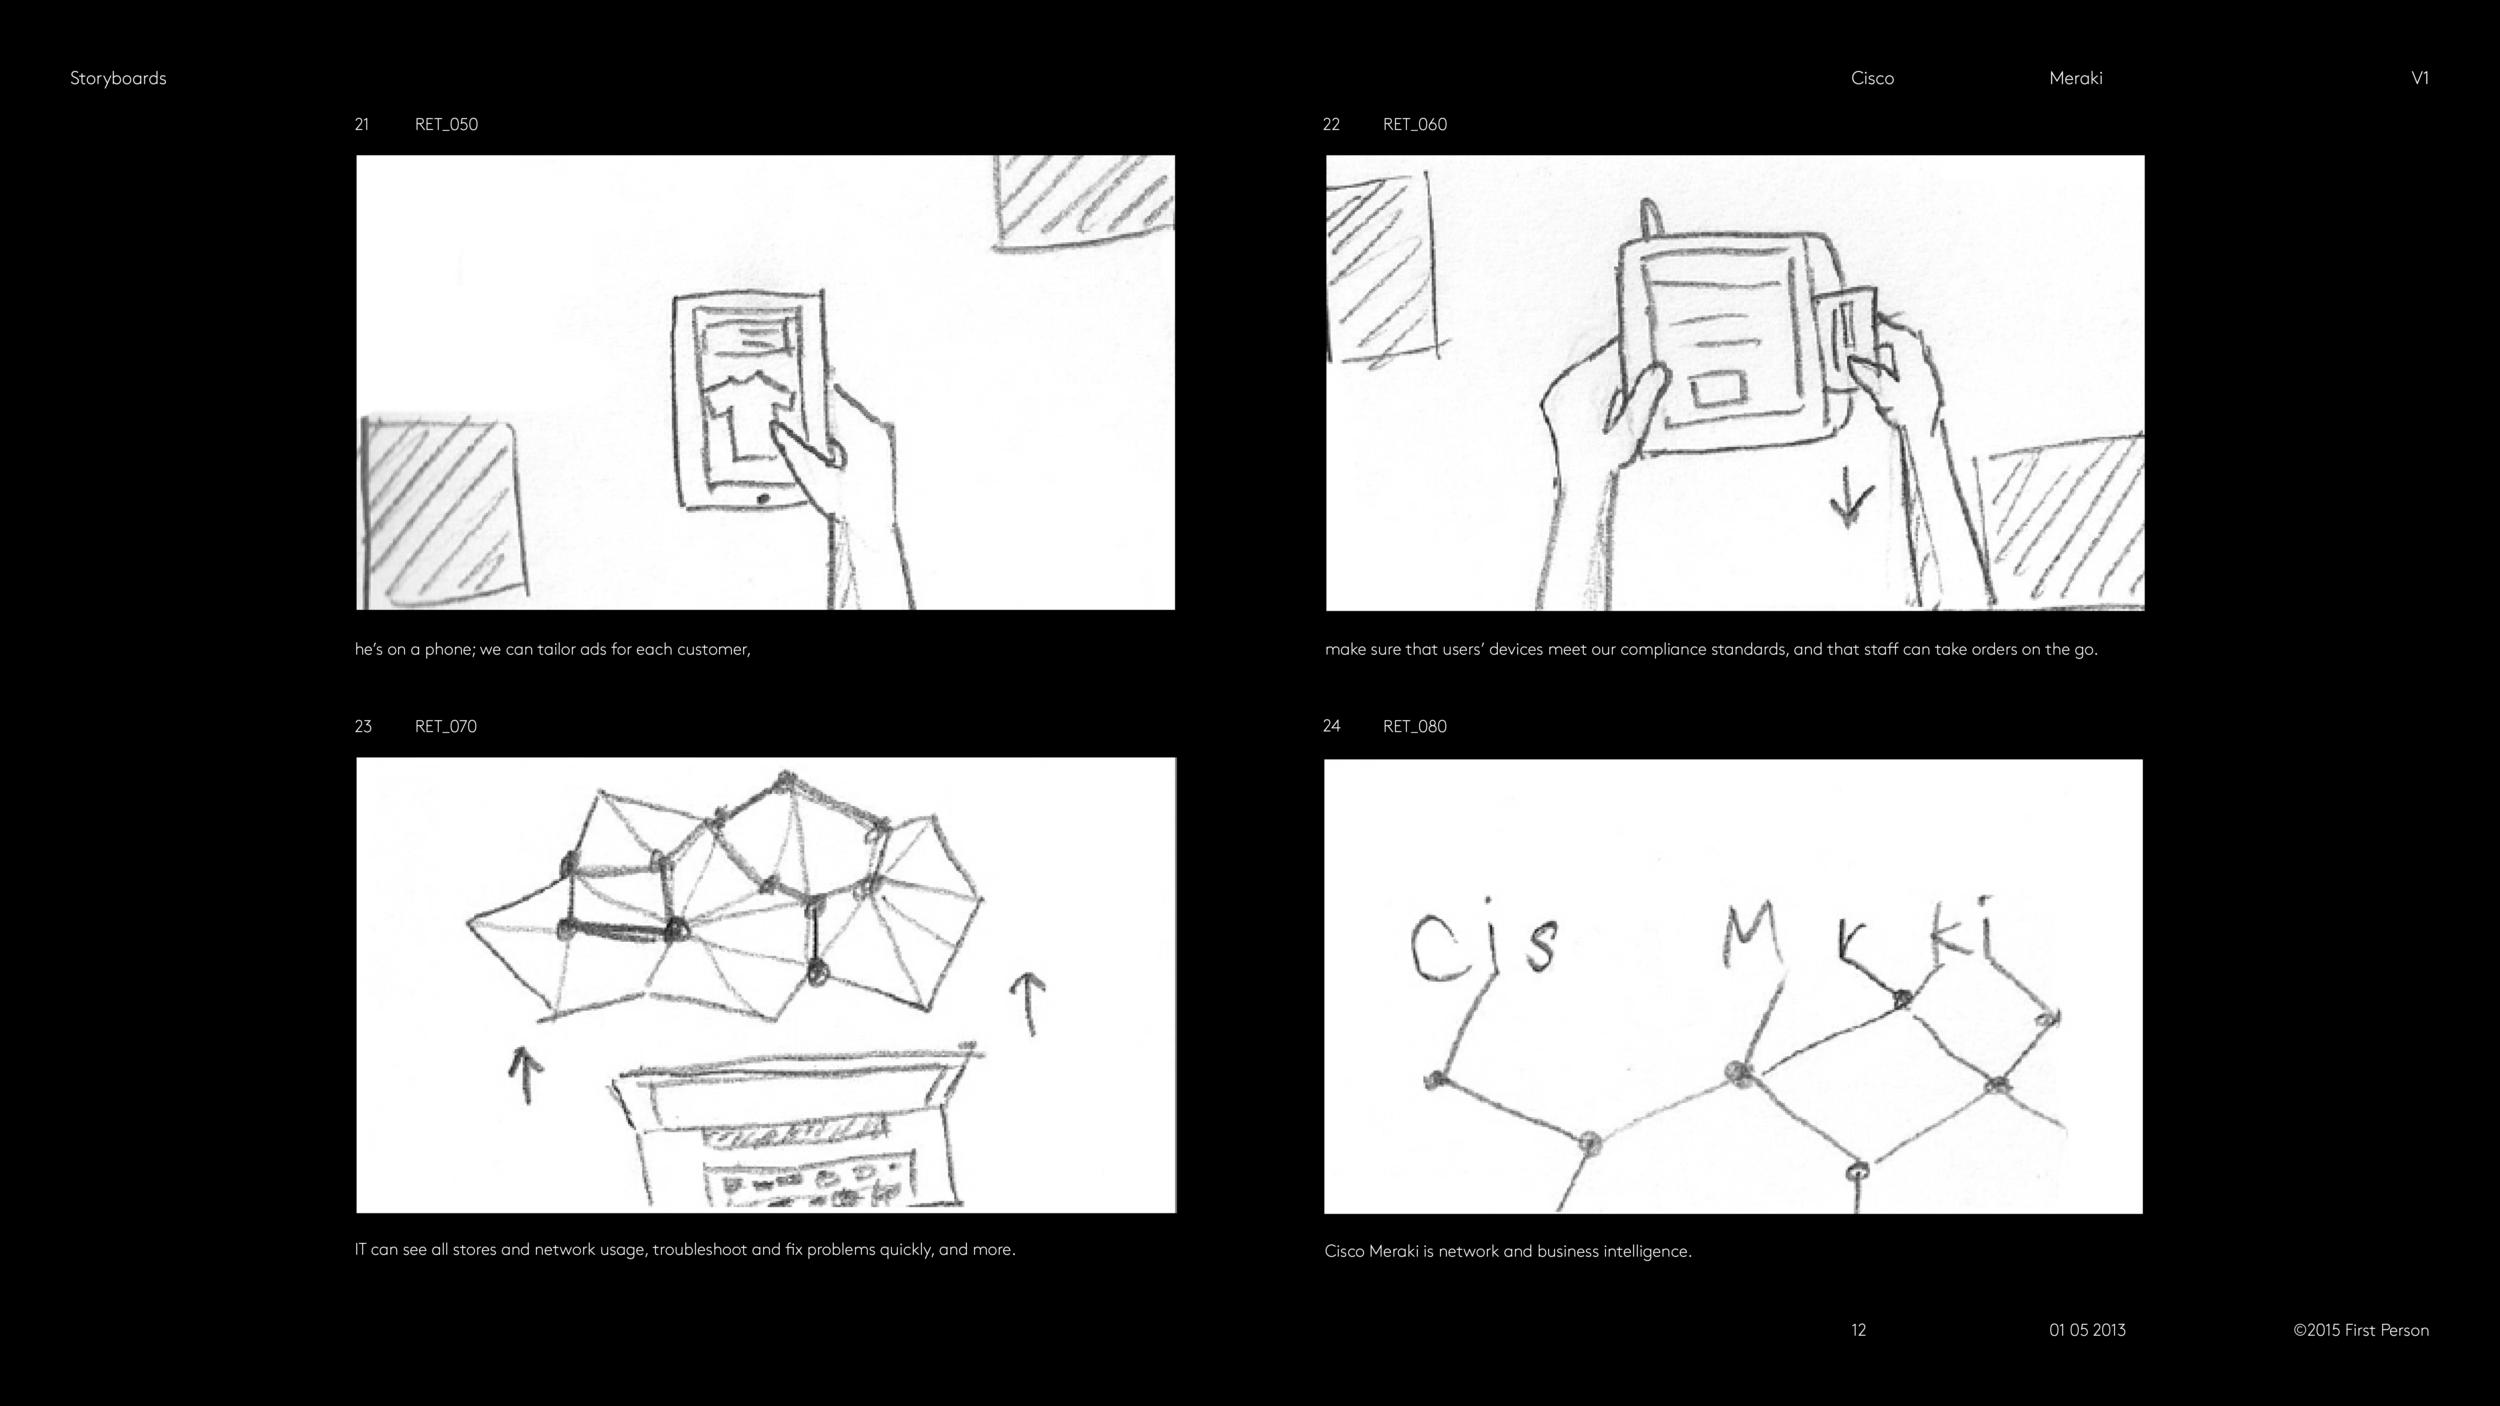 3431_CiscoMeraki_Storyboards_v01-12.png